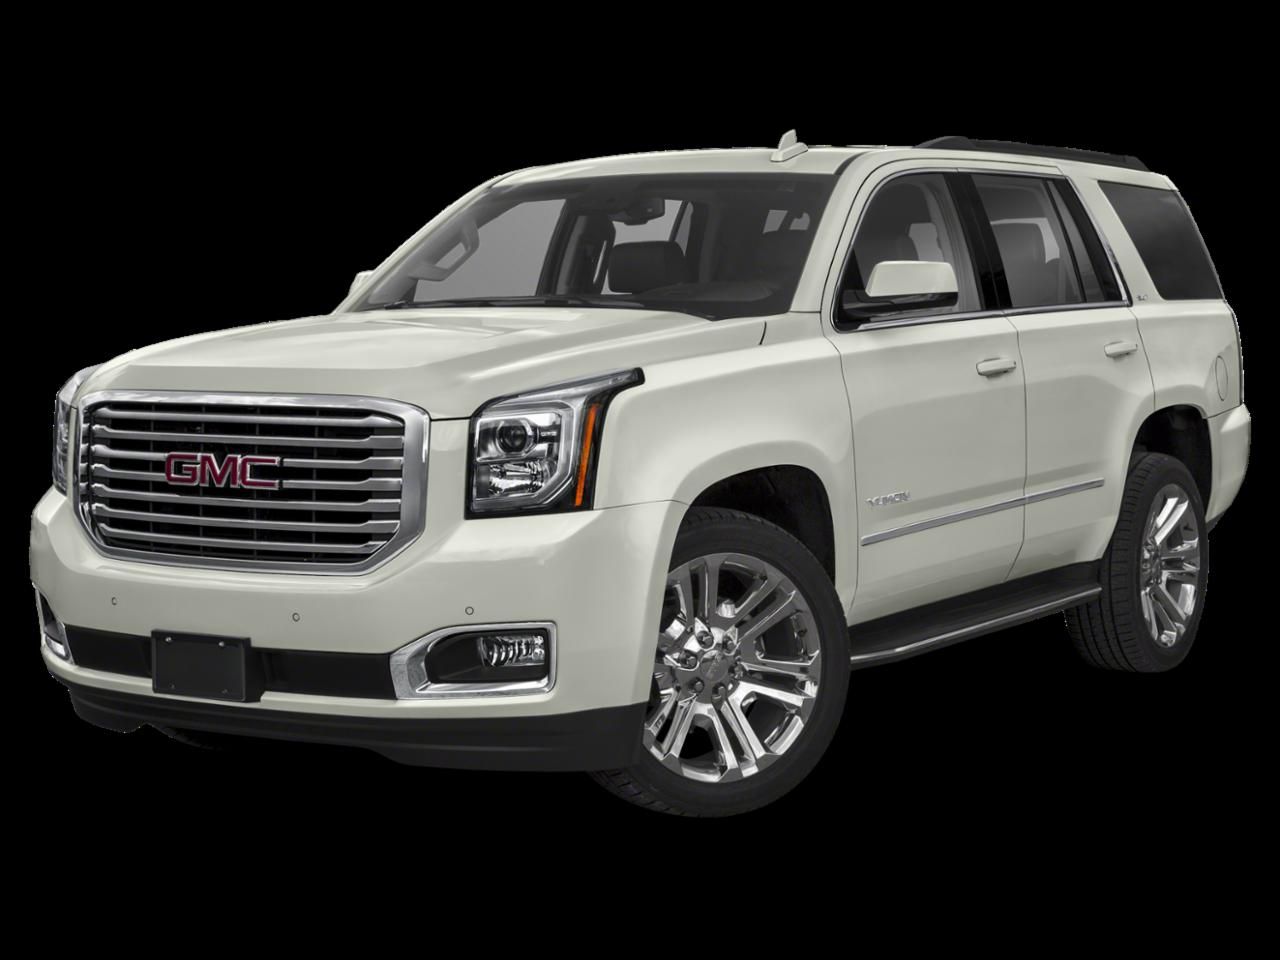 GMC 2019 Yukon SLT Standard Edition